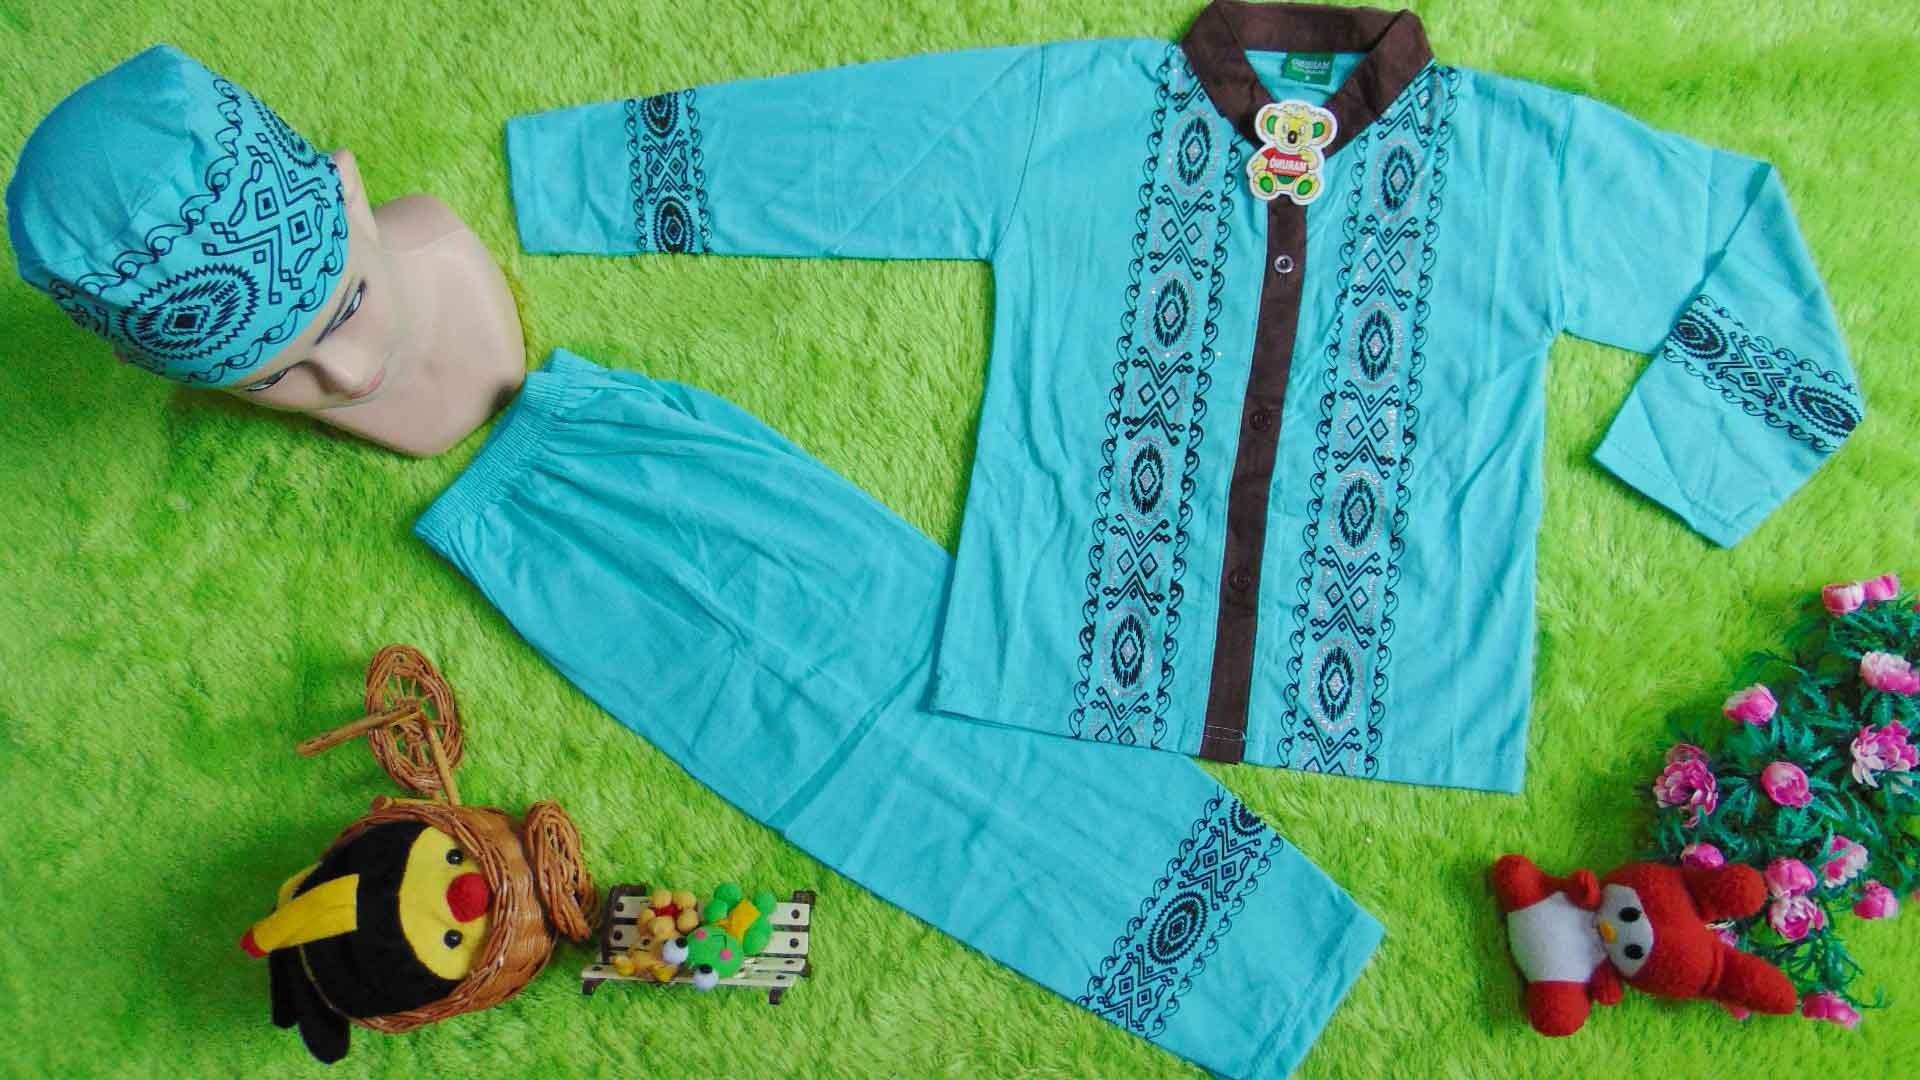 Design Baju Lebaran Laki Laki 4pde Paling Laris Setelan Baju Koko Muslim Lebaran Ramadhan